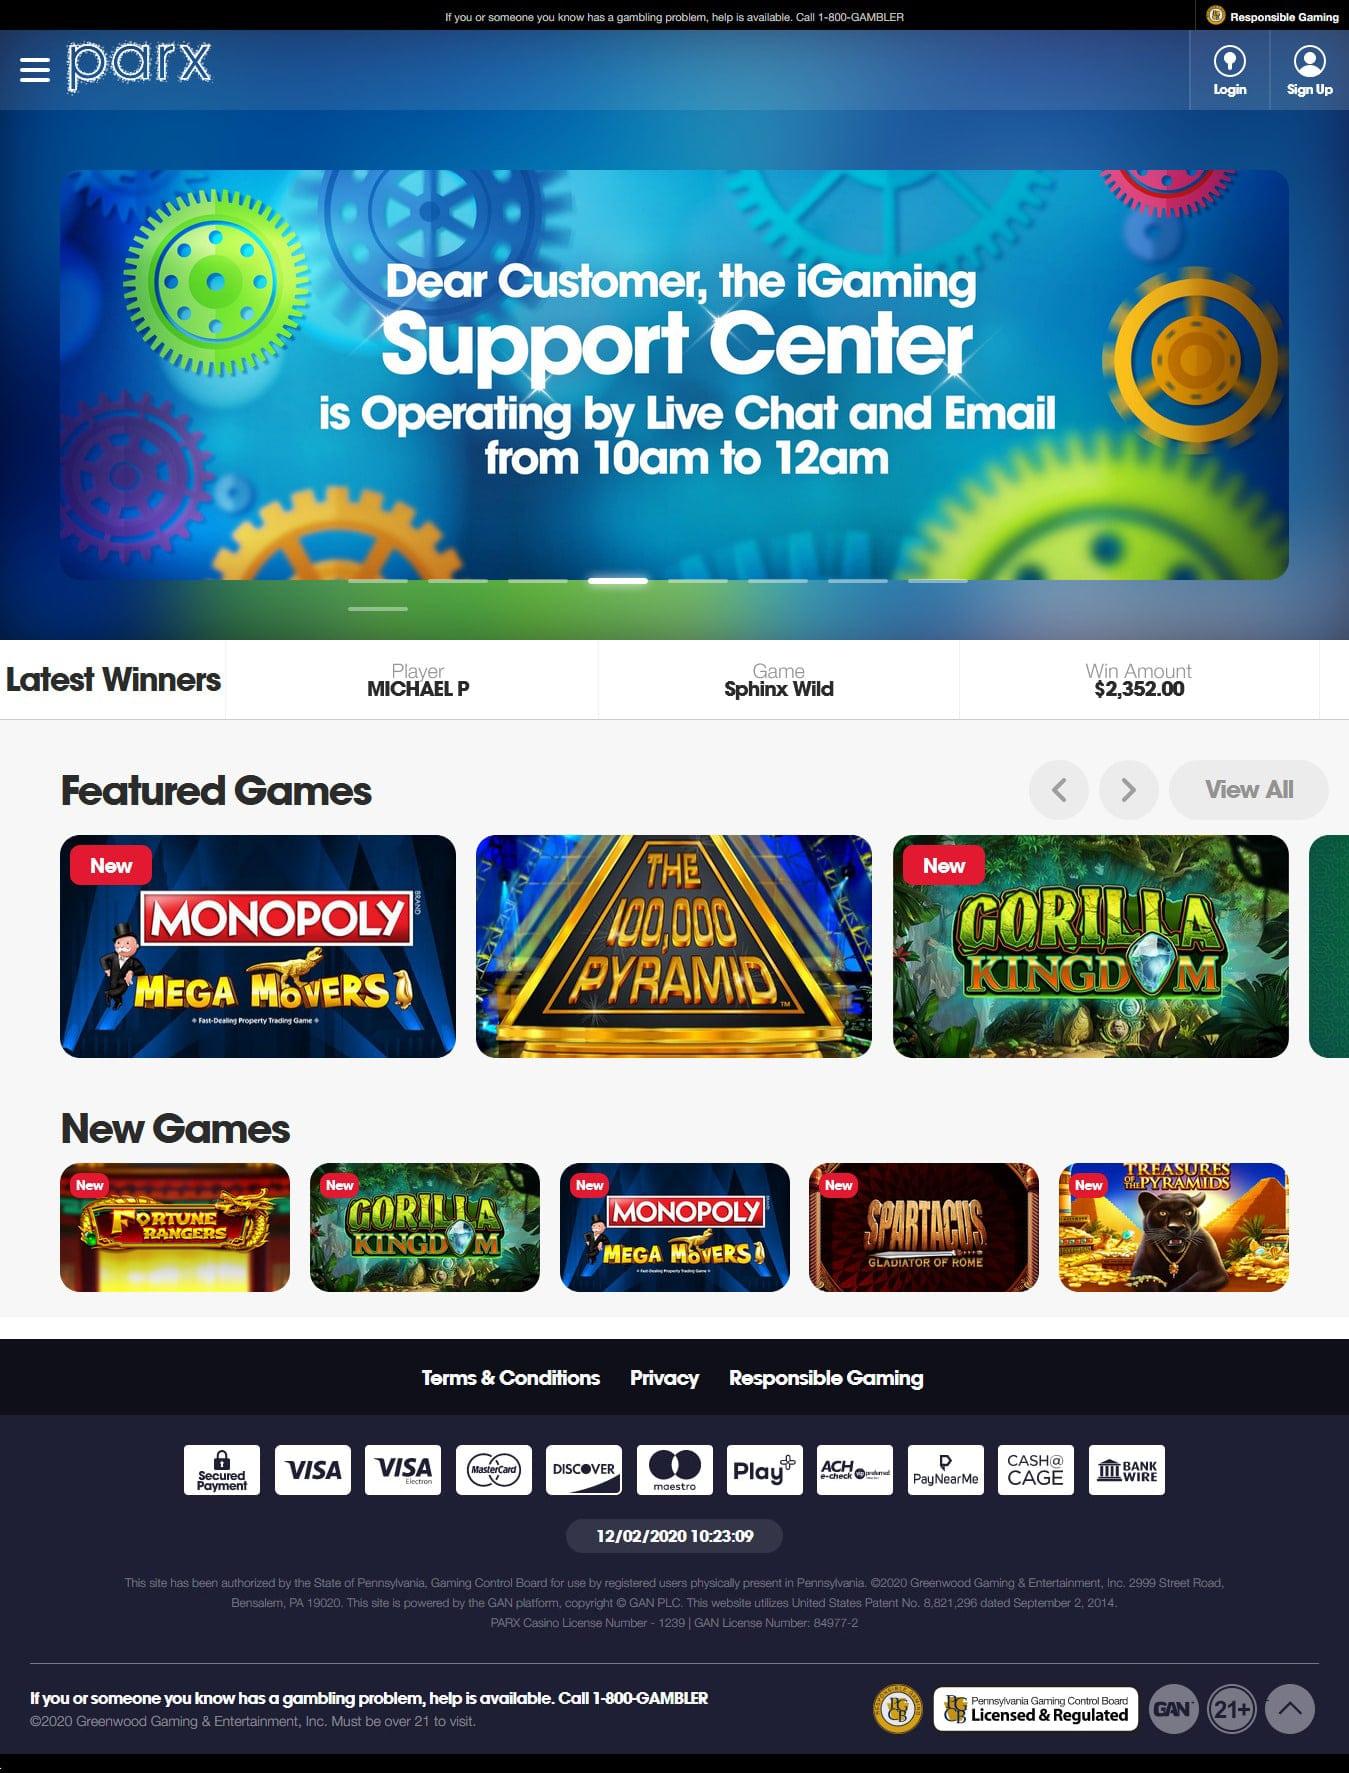 Online Casino Sportsbook Parx Casino